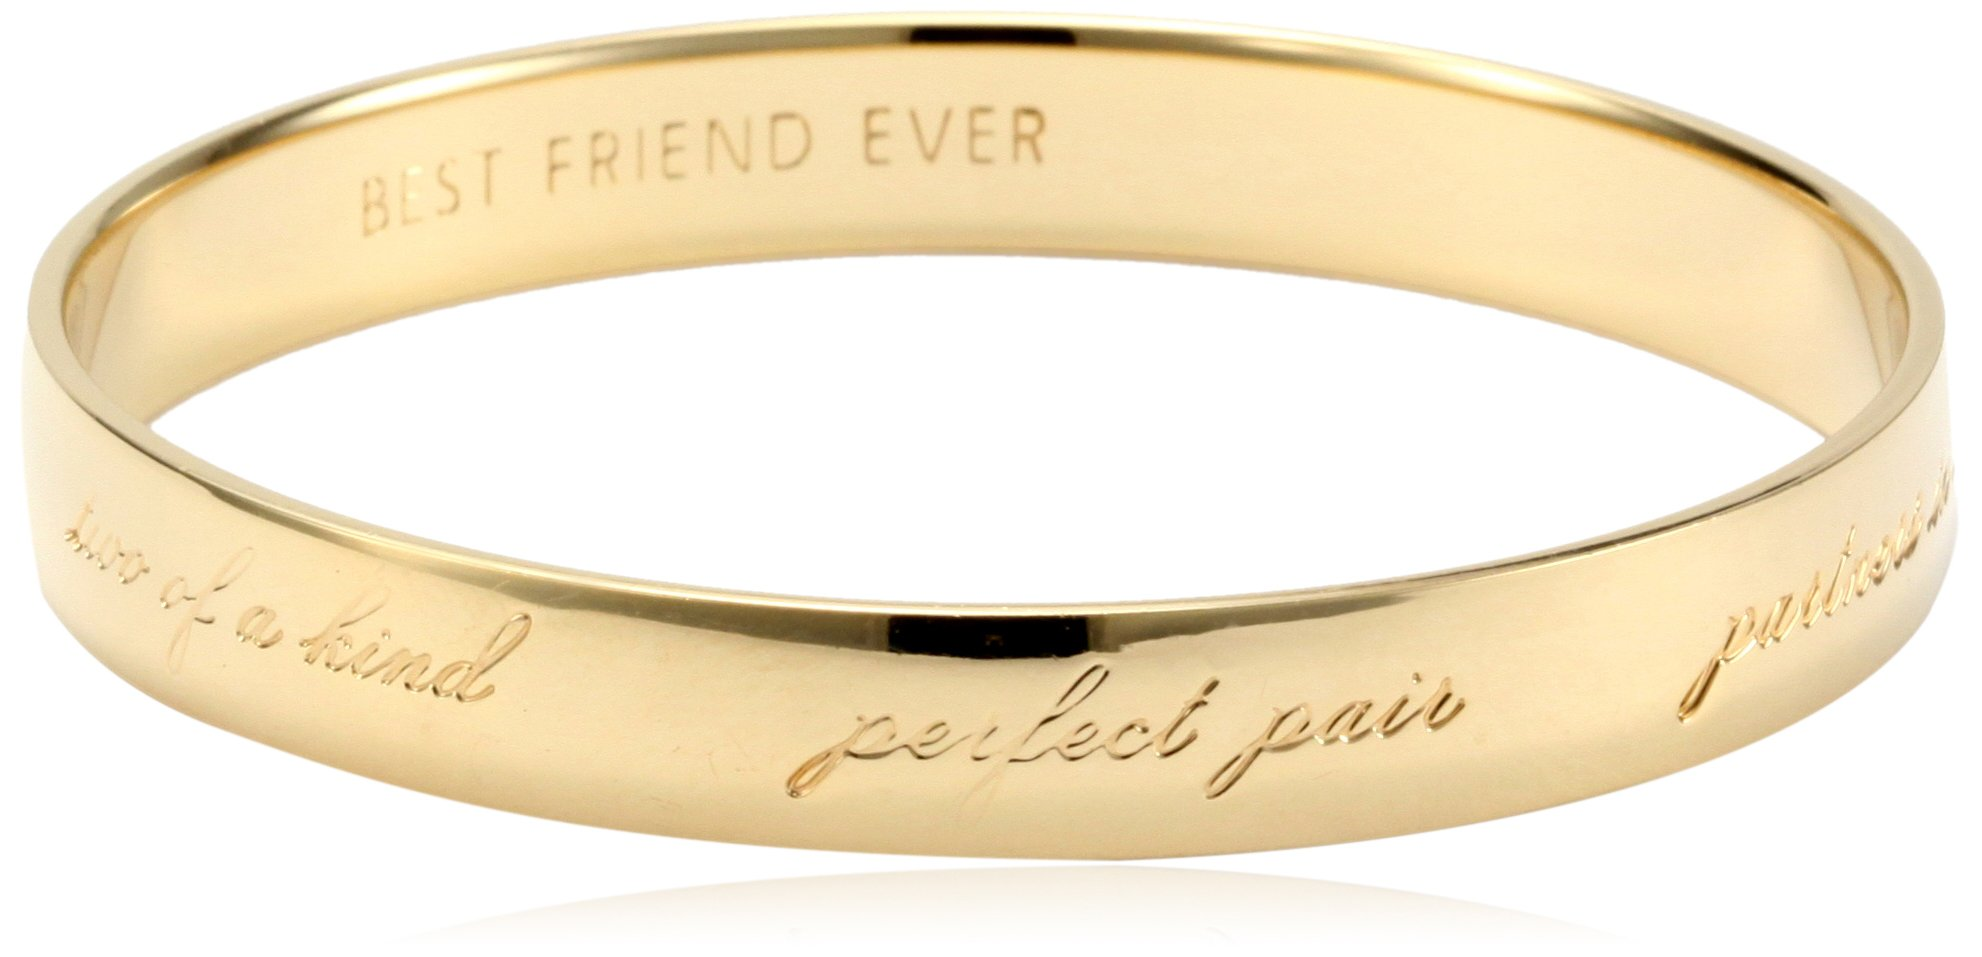 kate spade new york ''Best Friend Ever'' Bridesmaid Idiom Bangle Bracelet